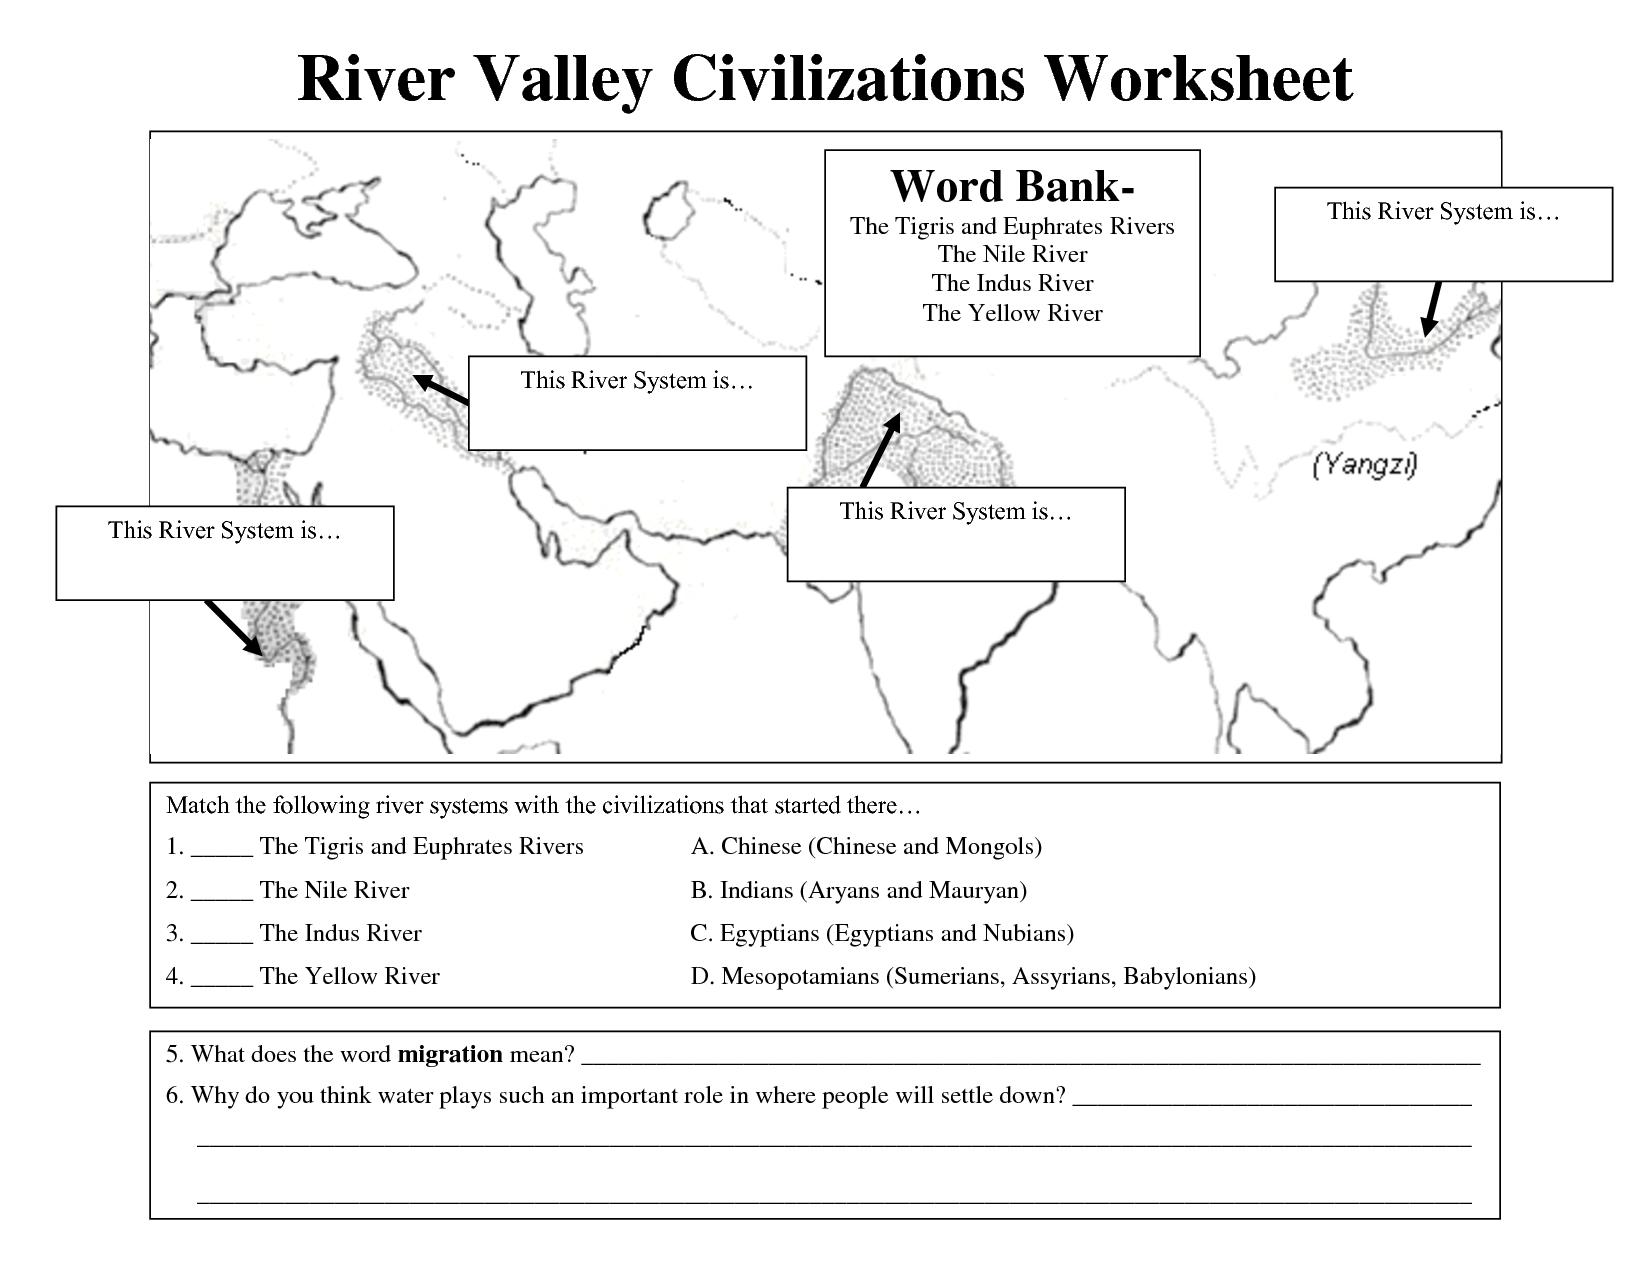 Early Civilizations Worksheet | River Valley Civilizations Worksheet - Free Printable Arkansas History Worksheets